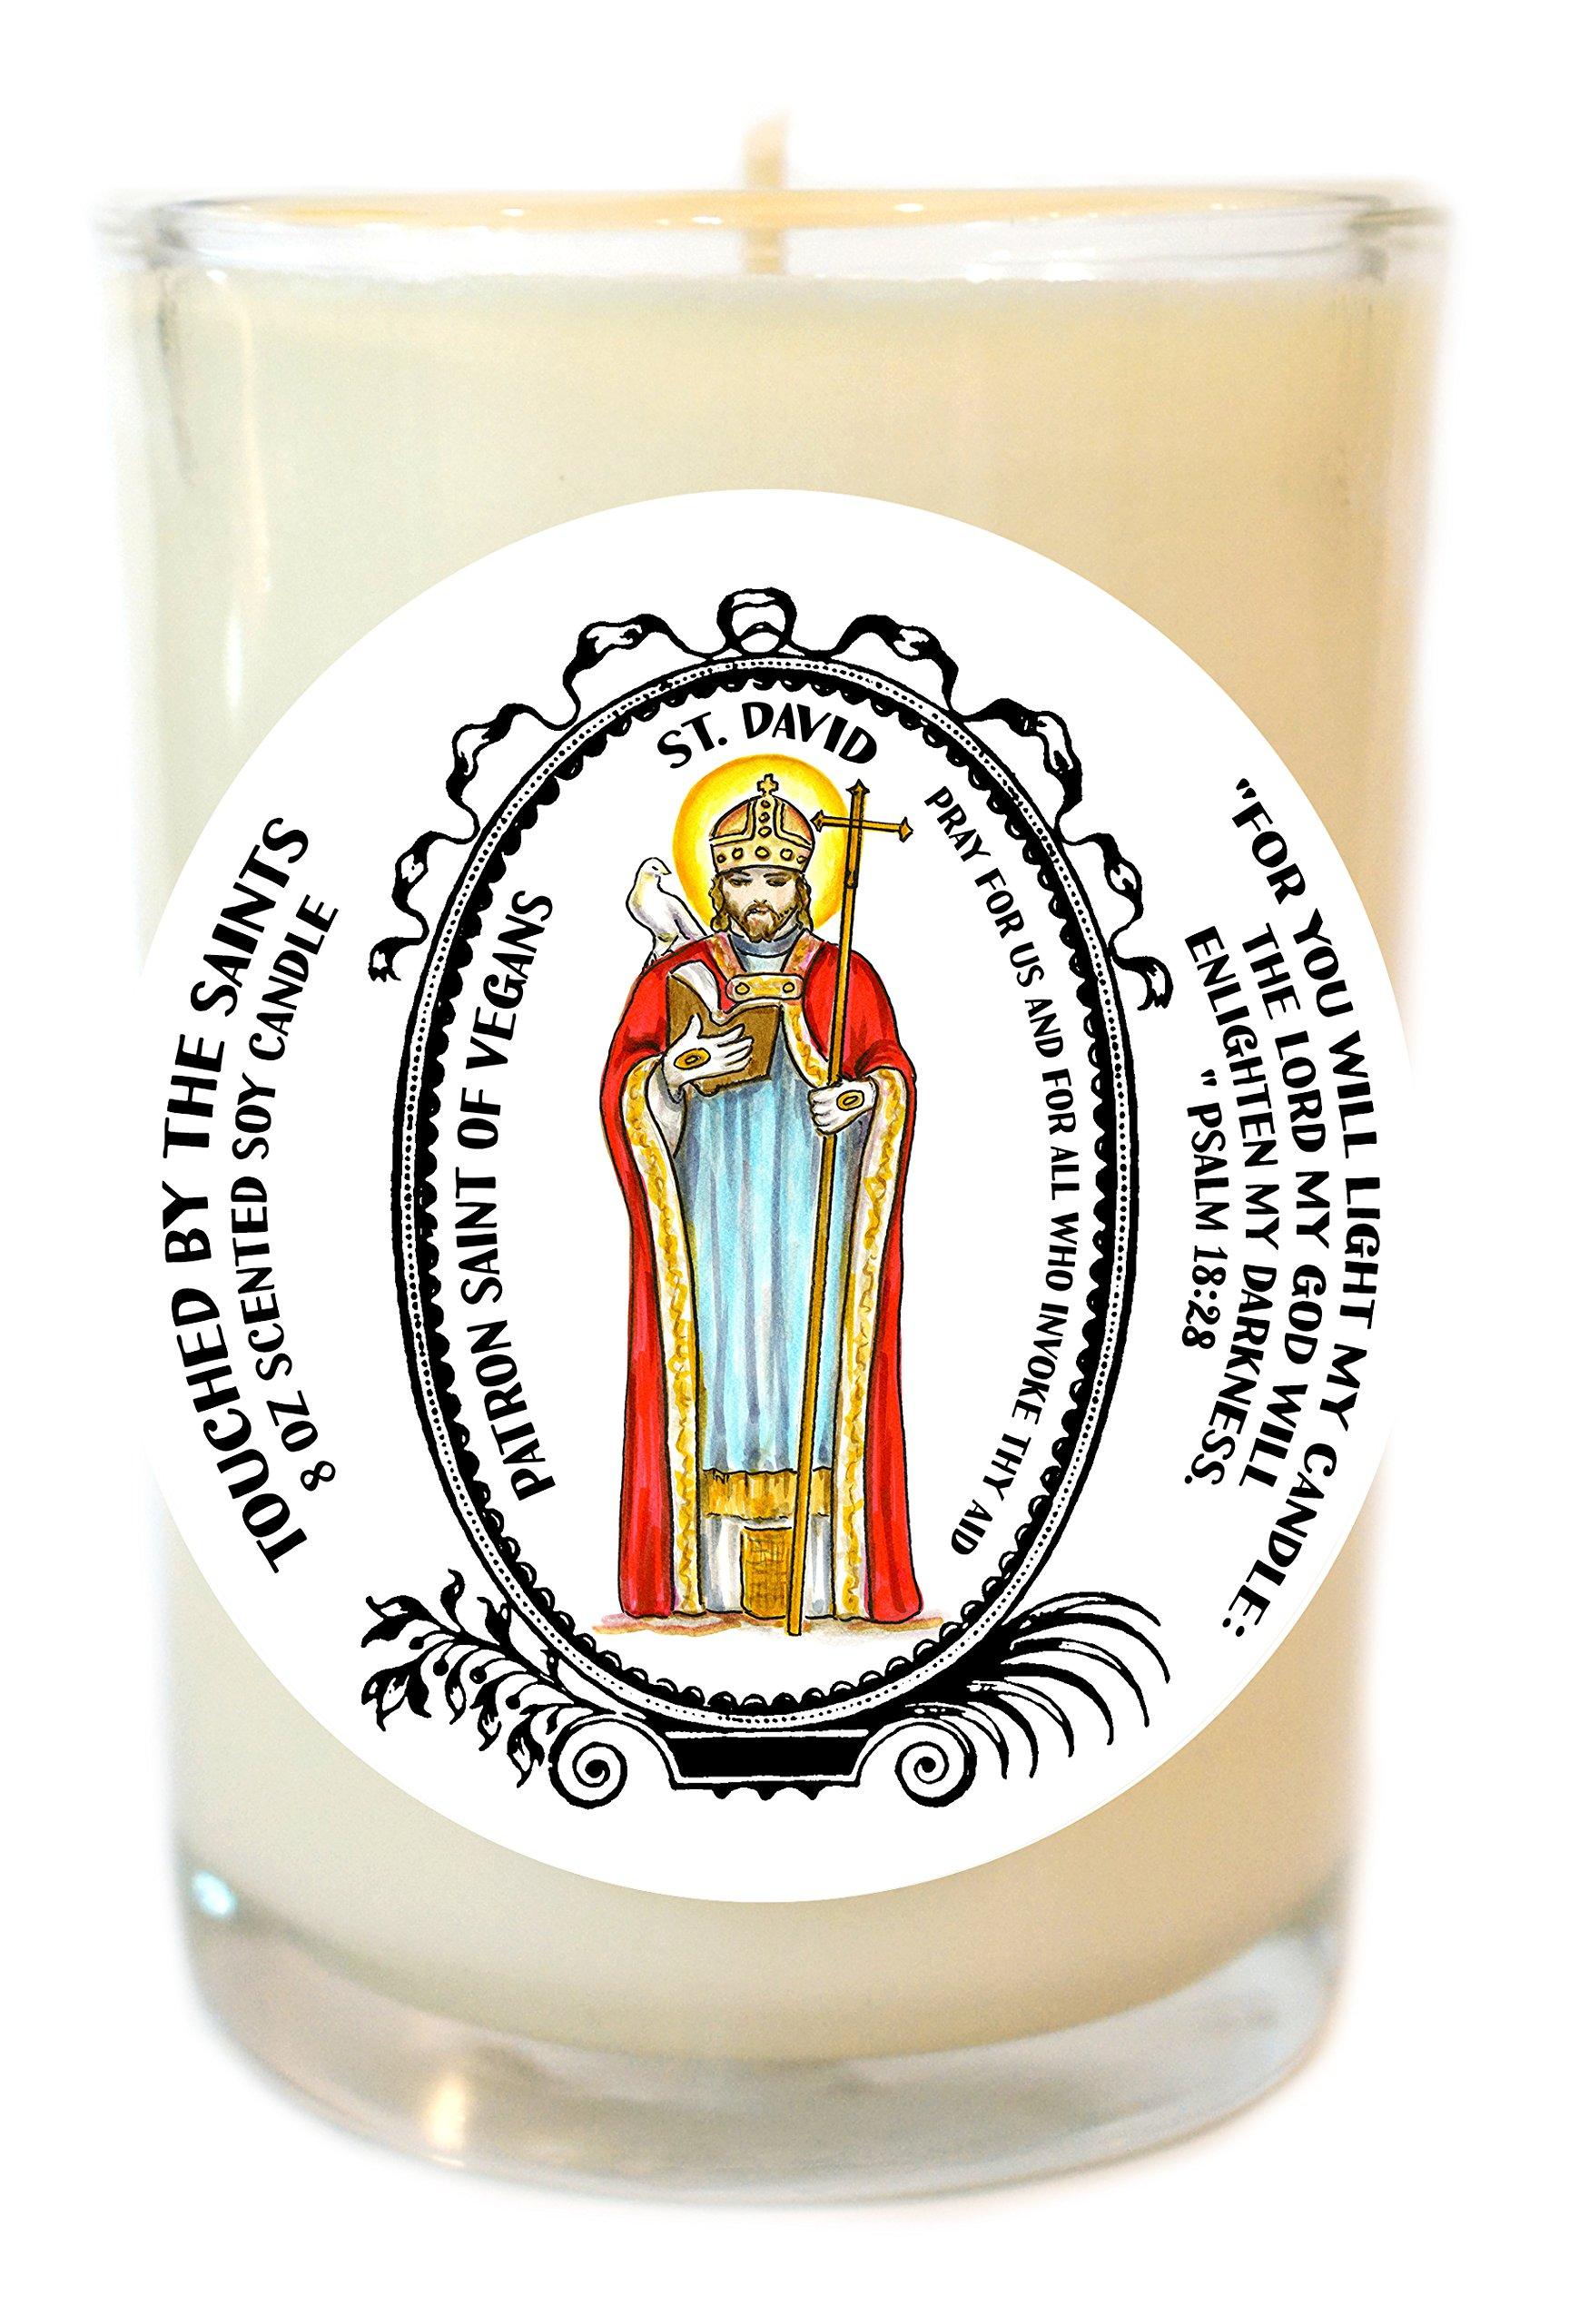 Saint David Patron of Vegans 8 Oz Scented Soy Glass Prayer Candle